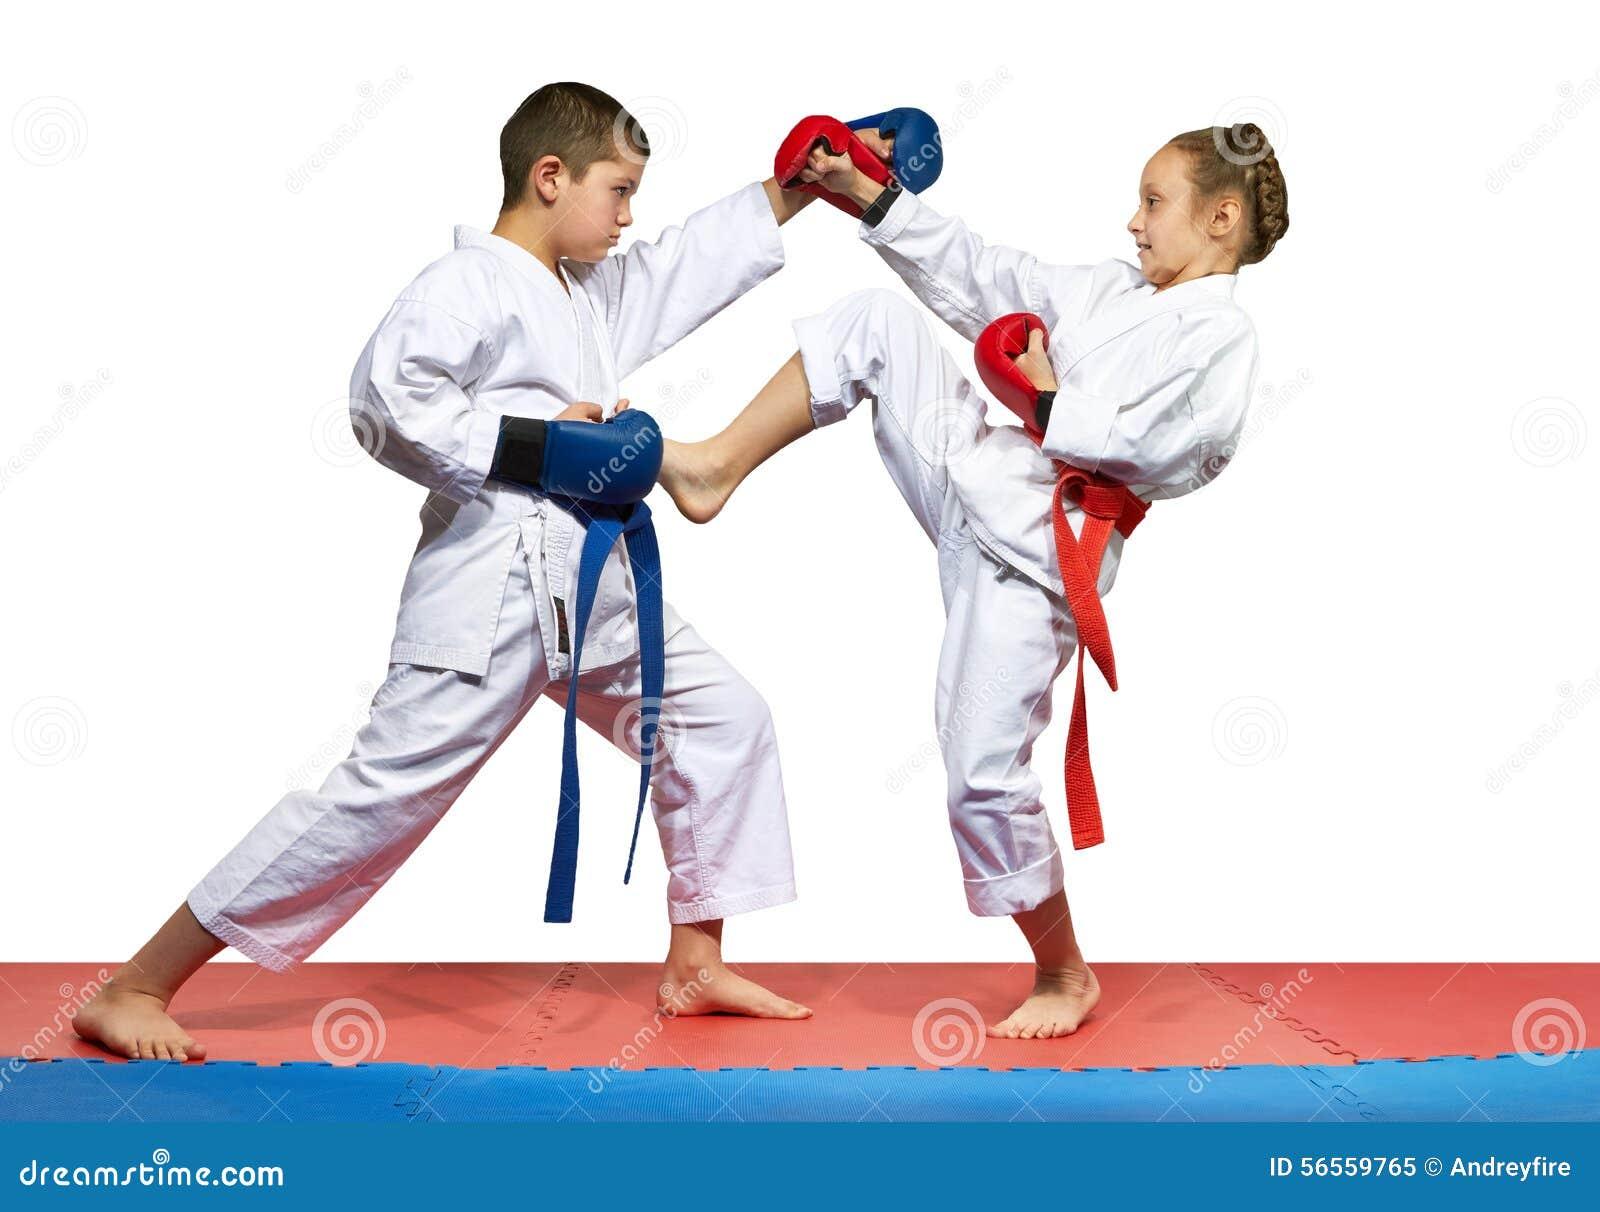 Download Οι νέοι αθλητές κτυπούν το πόδι και το χέρι λακτίσματος Στοκ Εικόνα - εικόνα από εμμονή, πόδι: 56559765